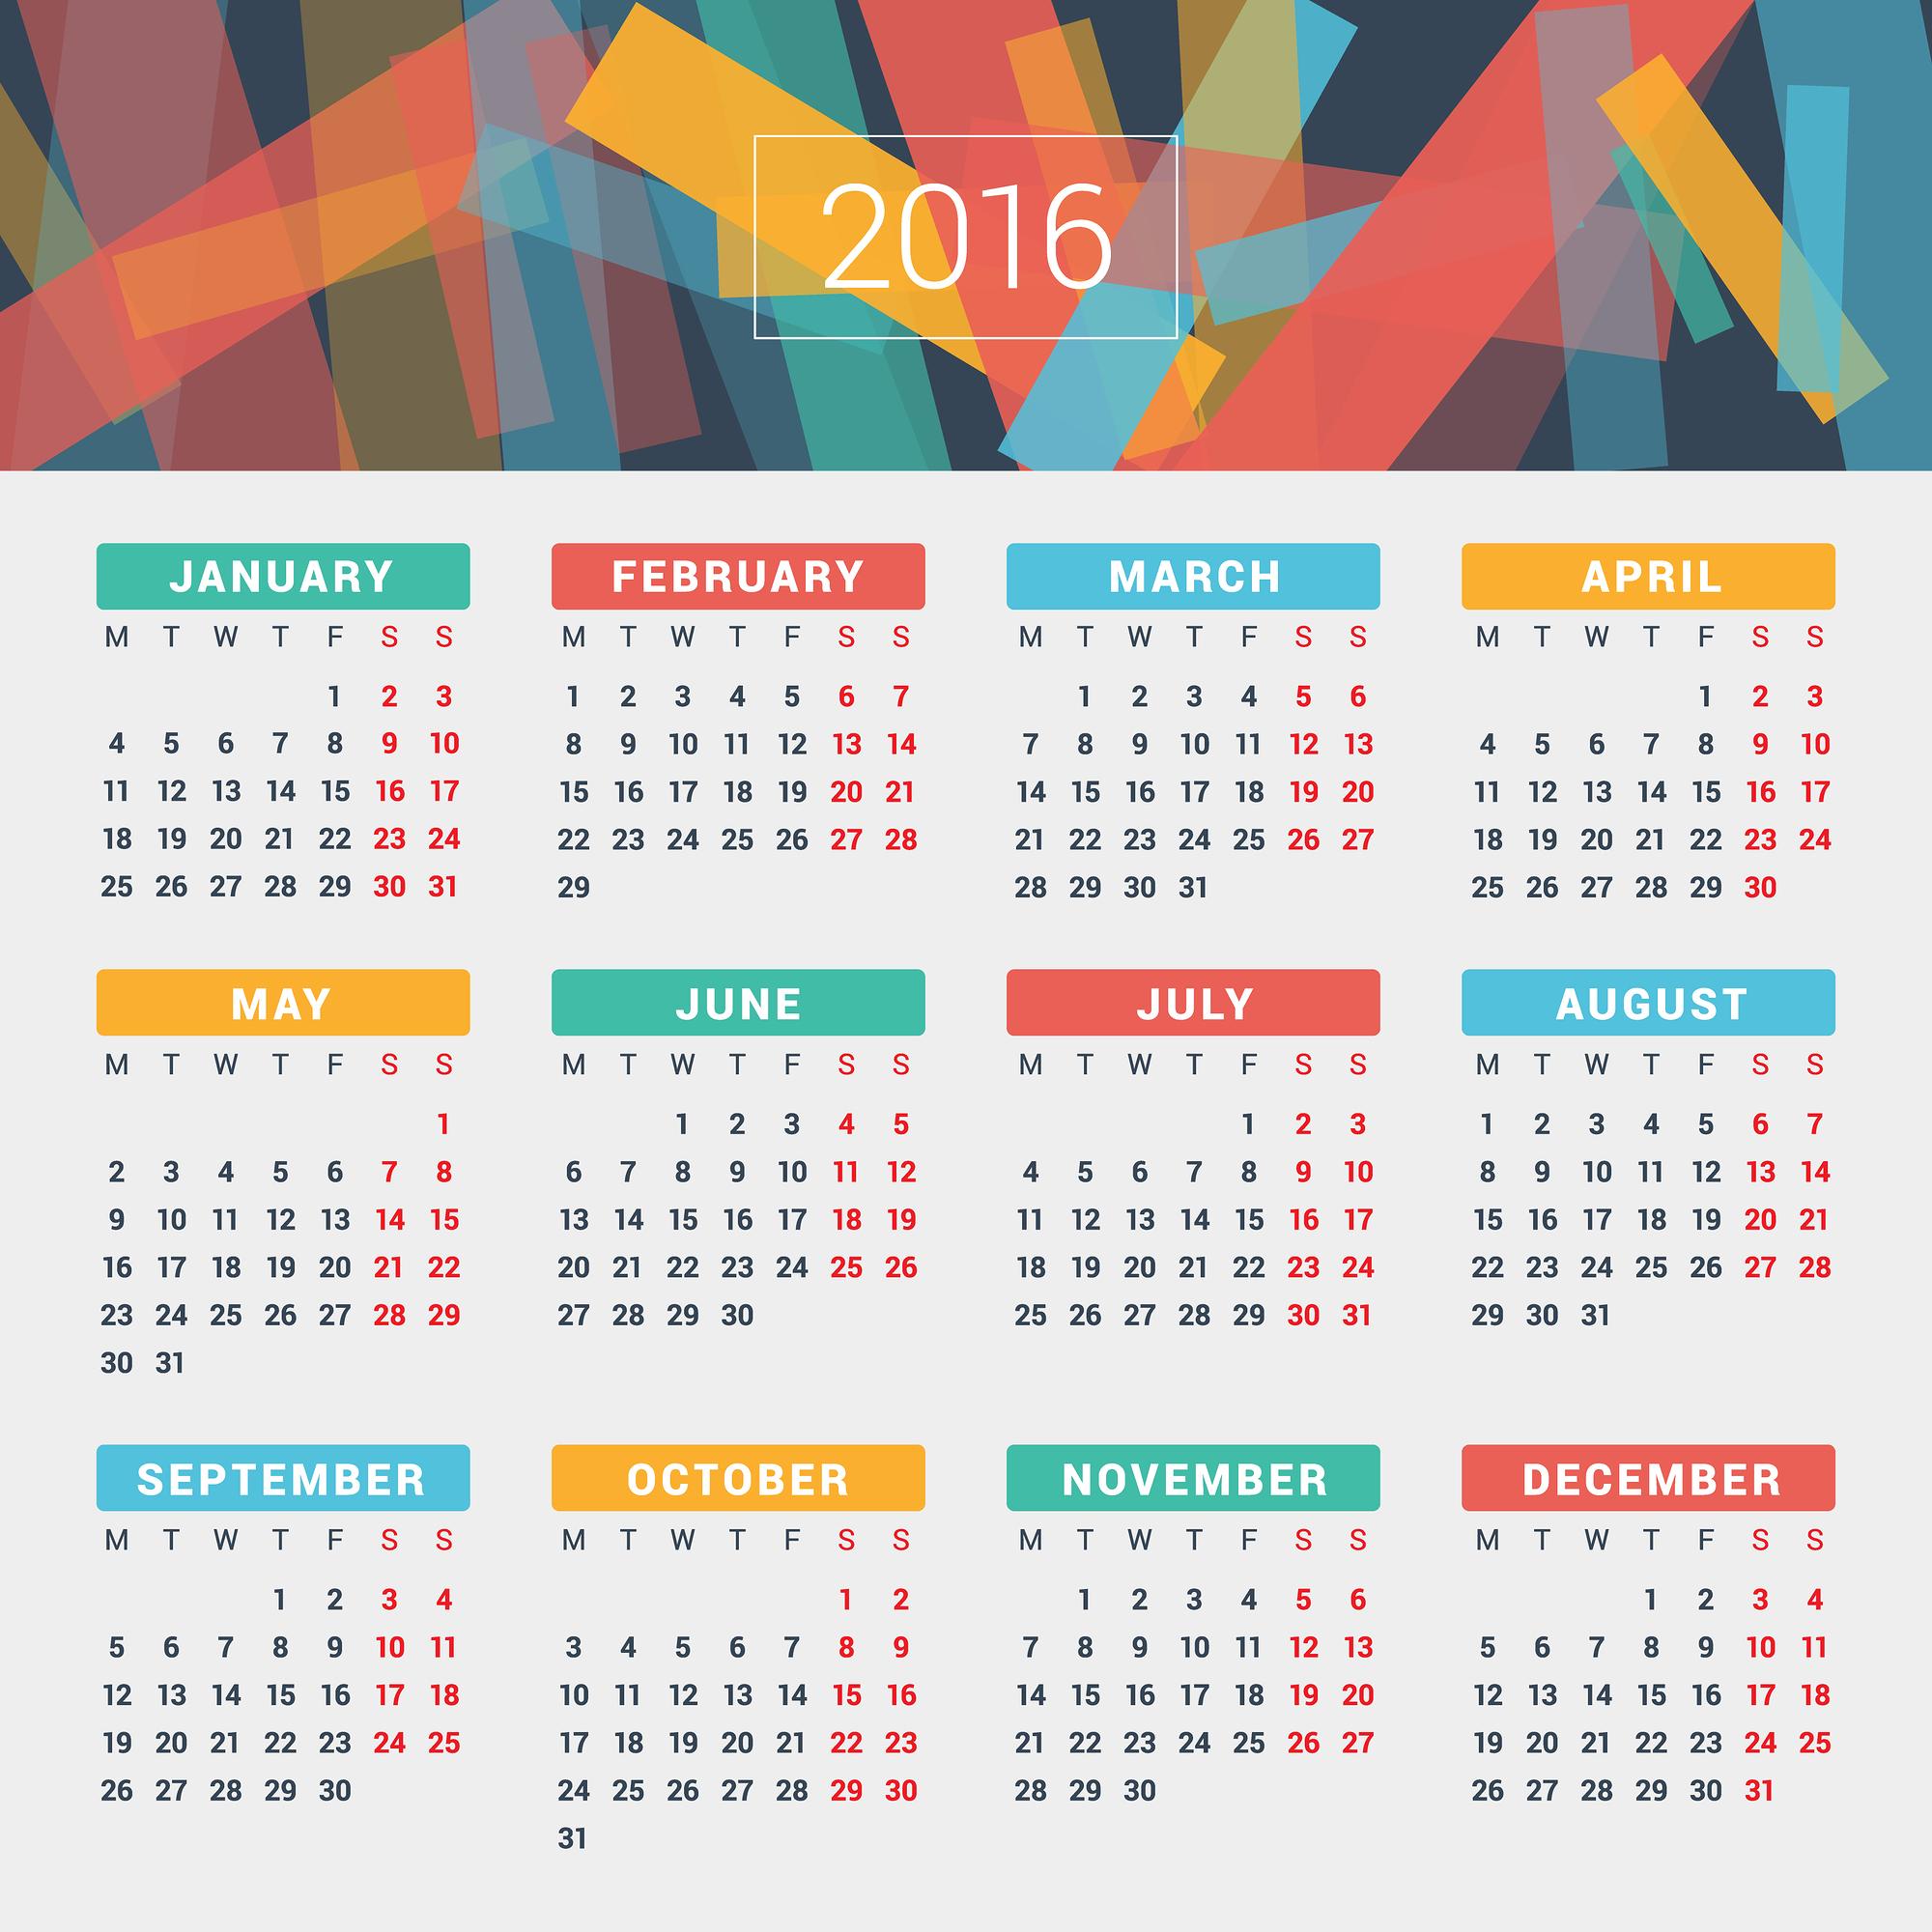 2000x2000px 2016 calendar hd wallpaper wallpapersafari